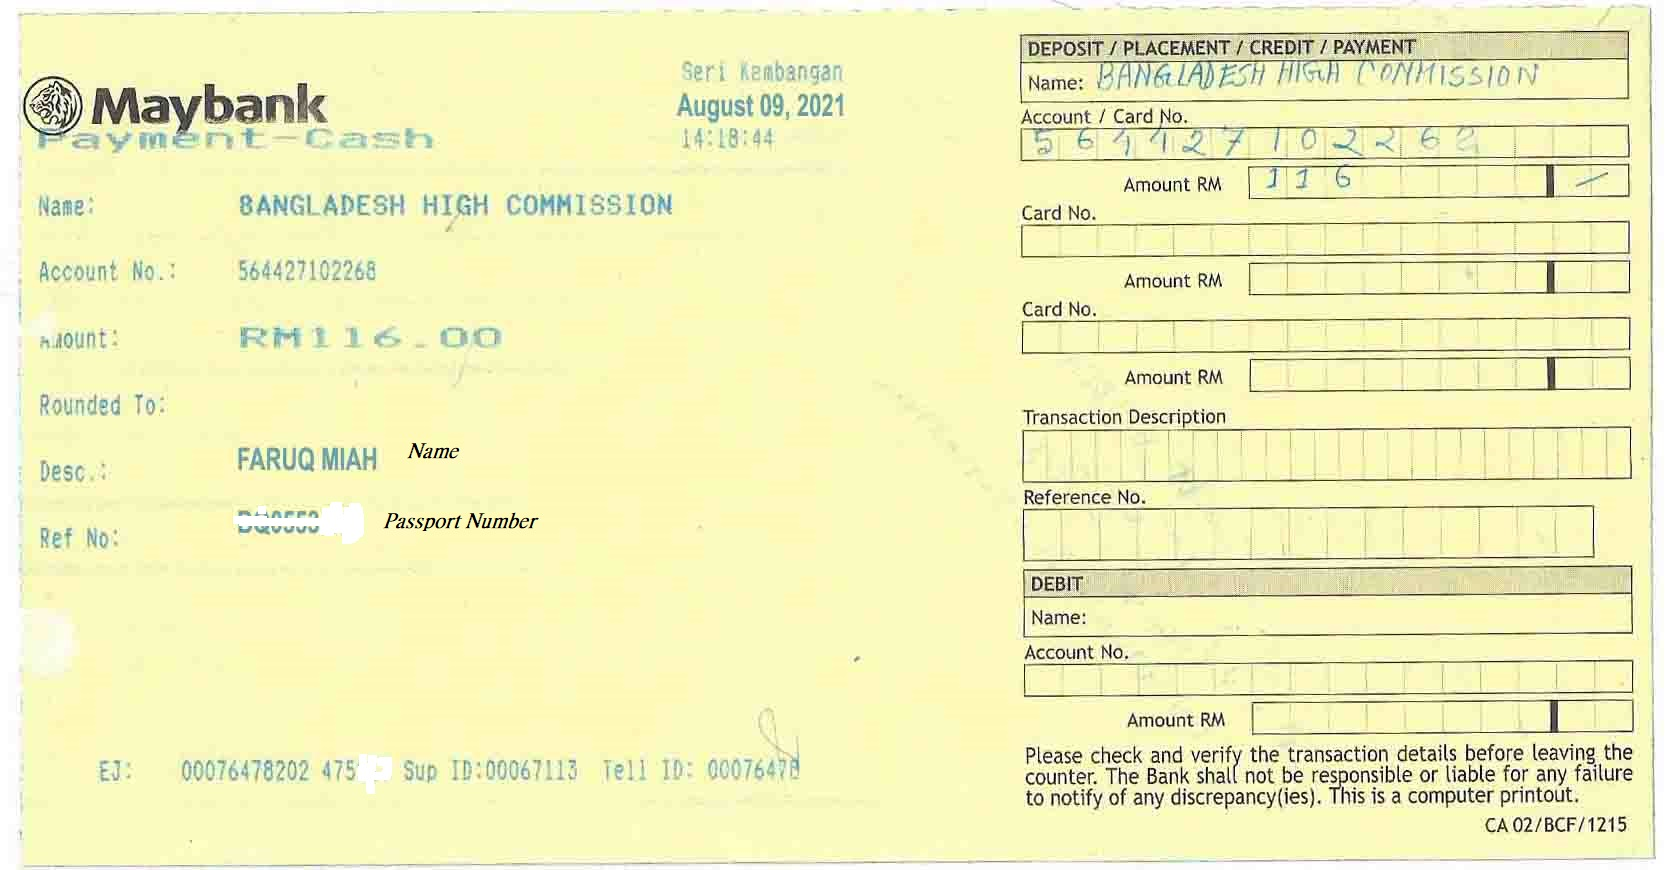 BDhkl Maybank Money deposit